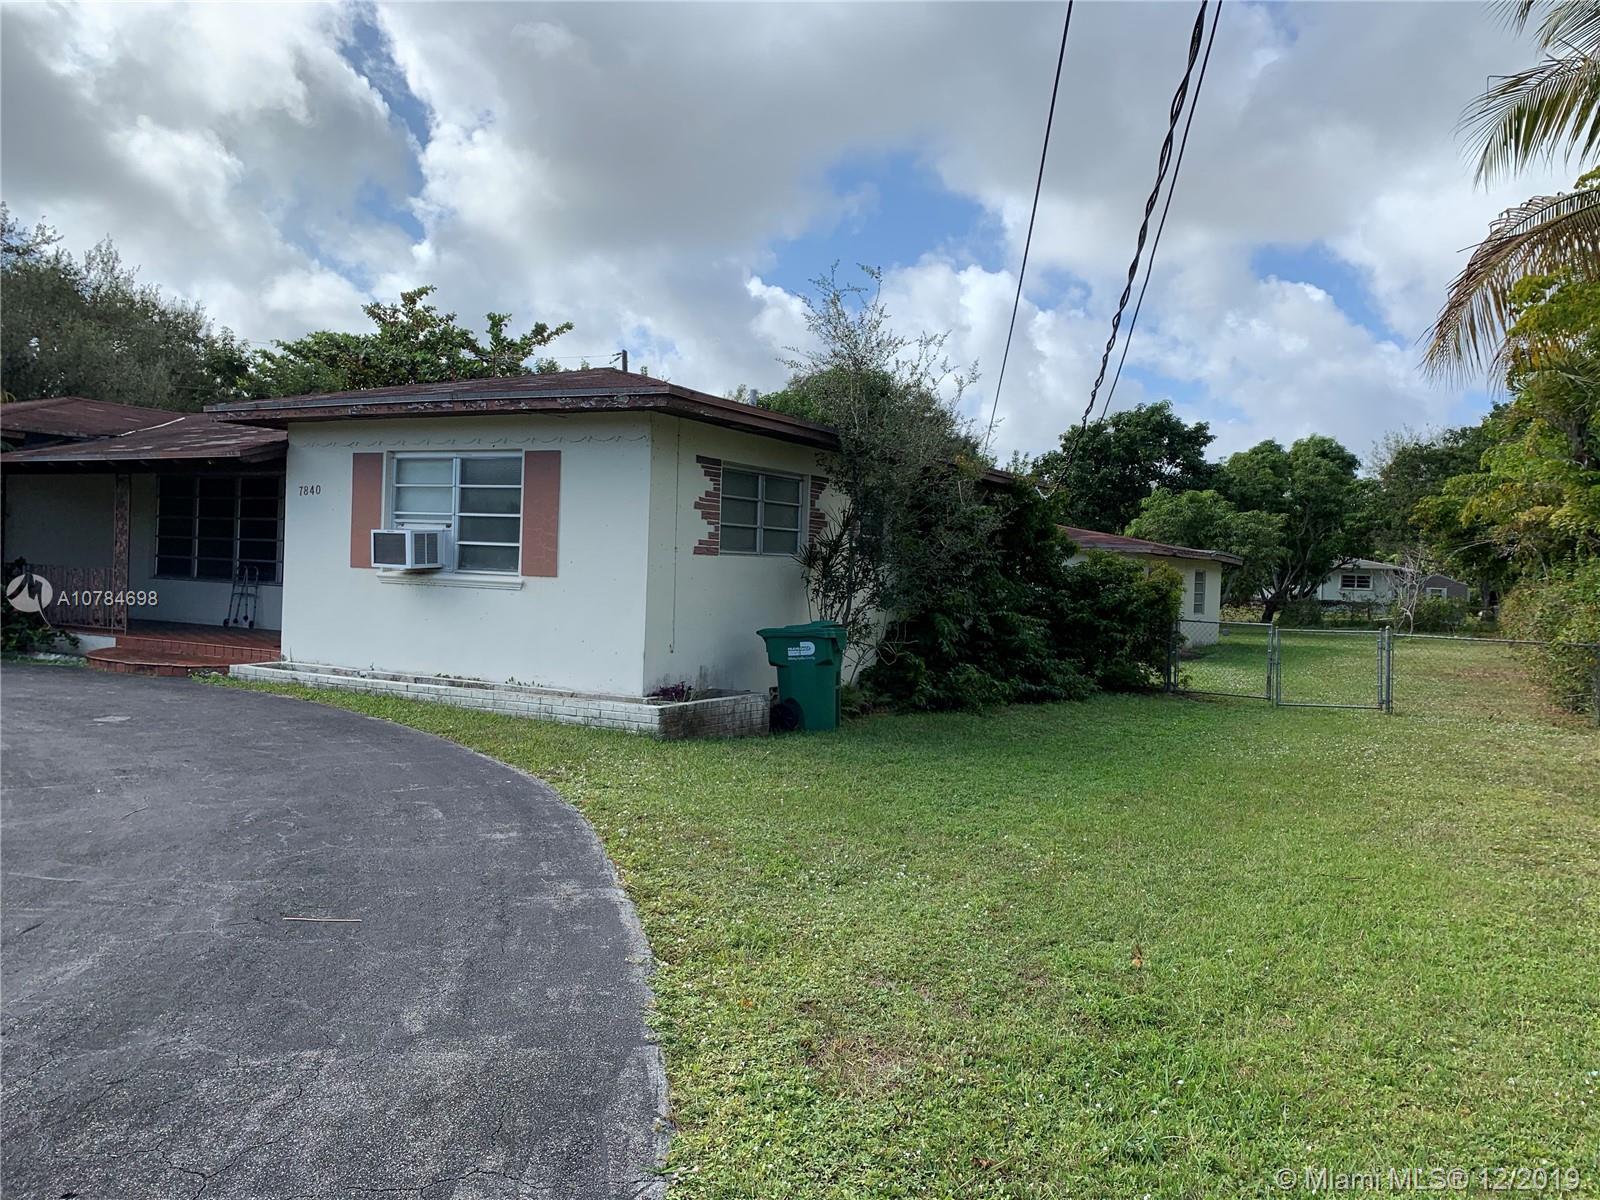 7840 SW 71st Ave, Miami FL 33143